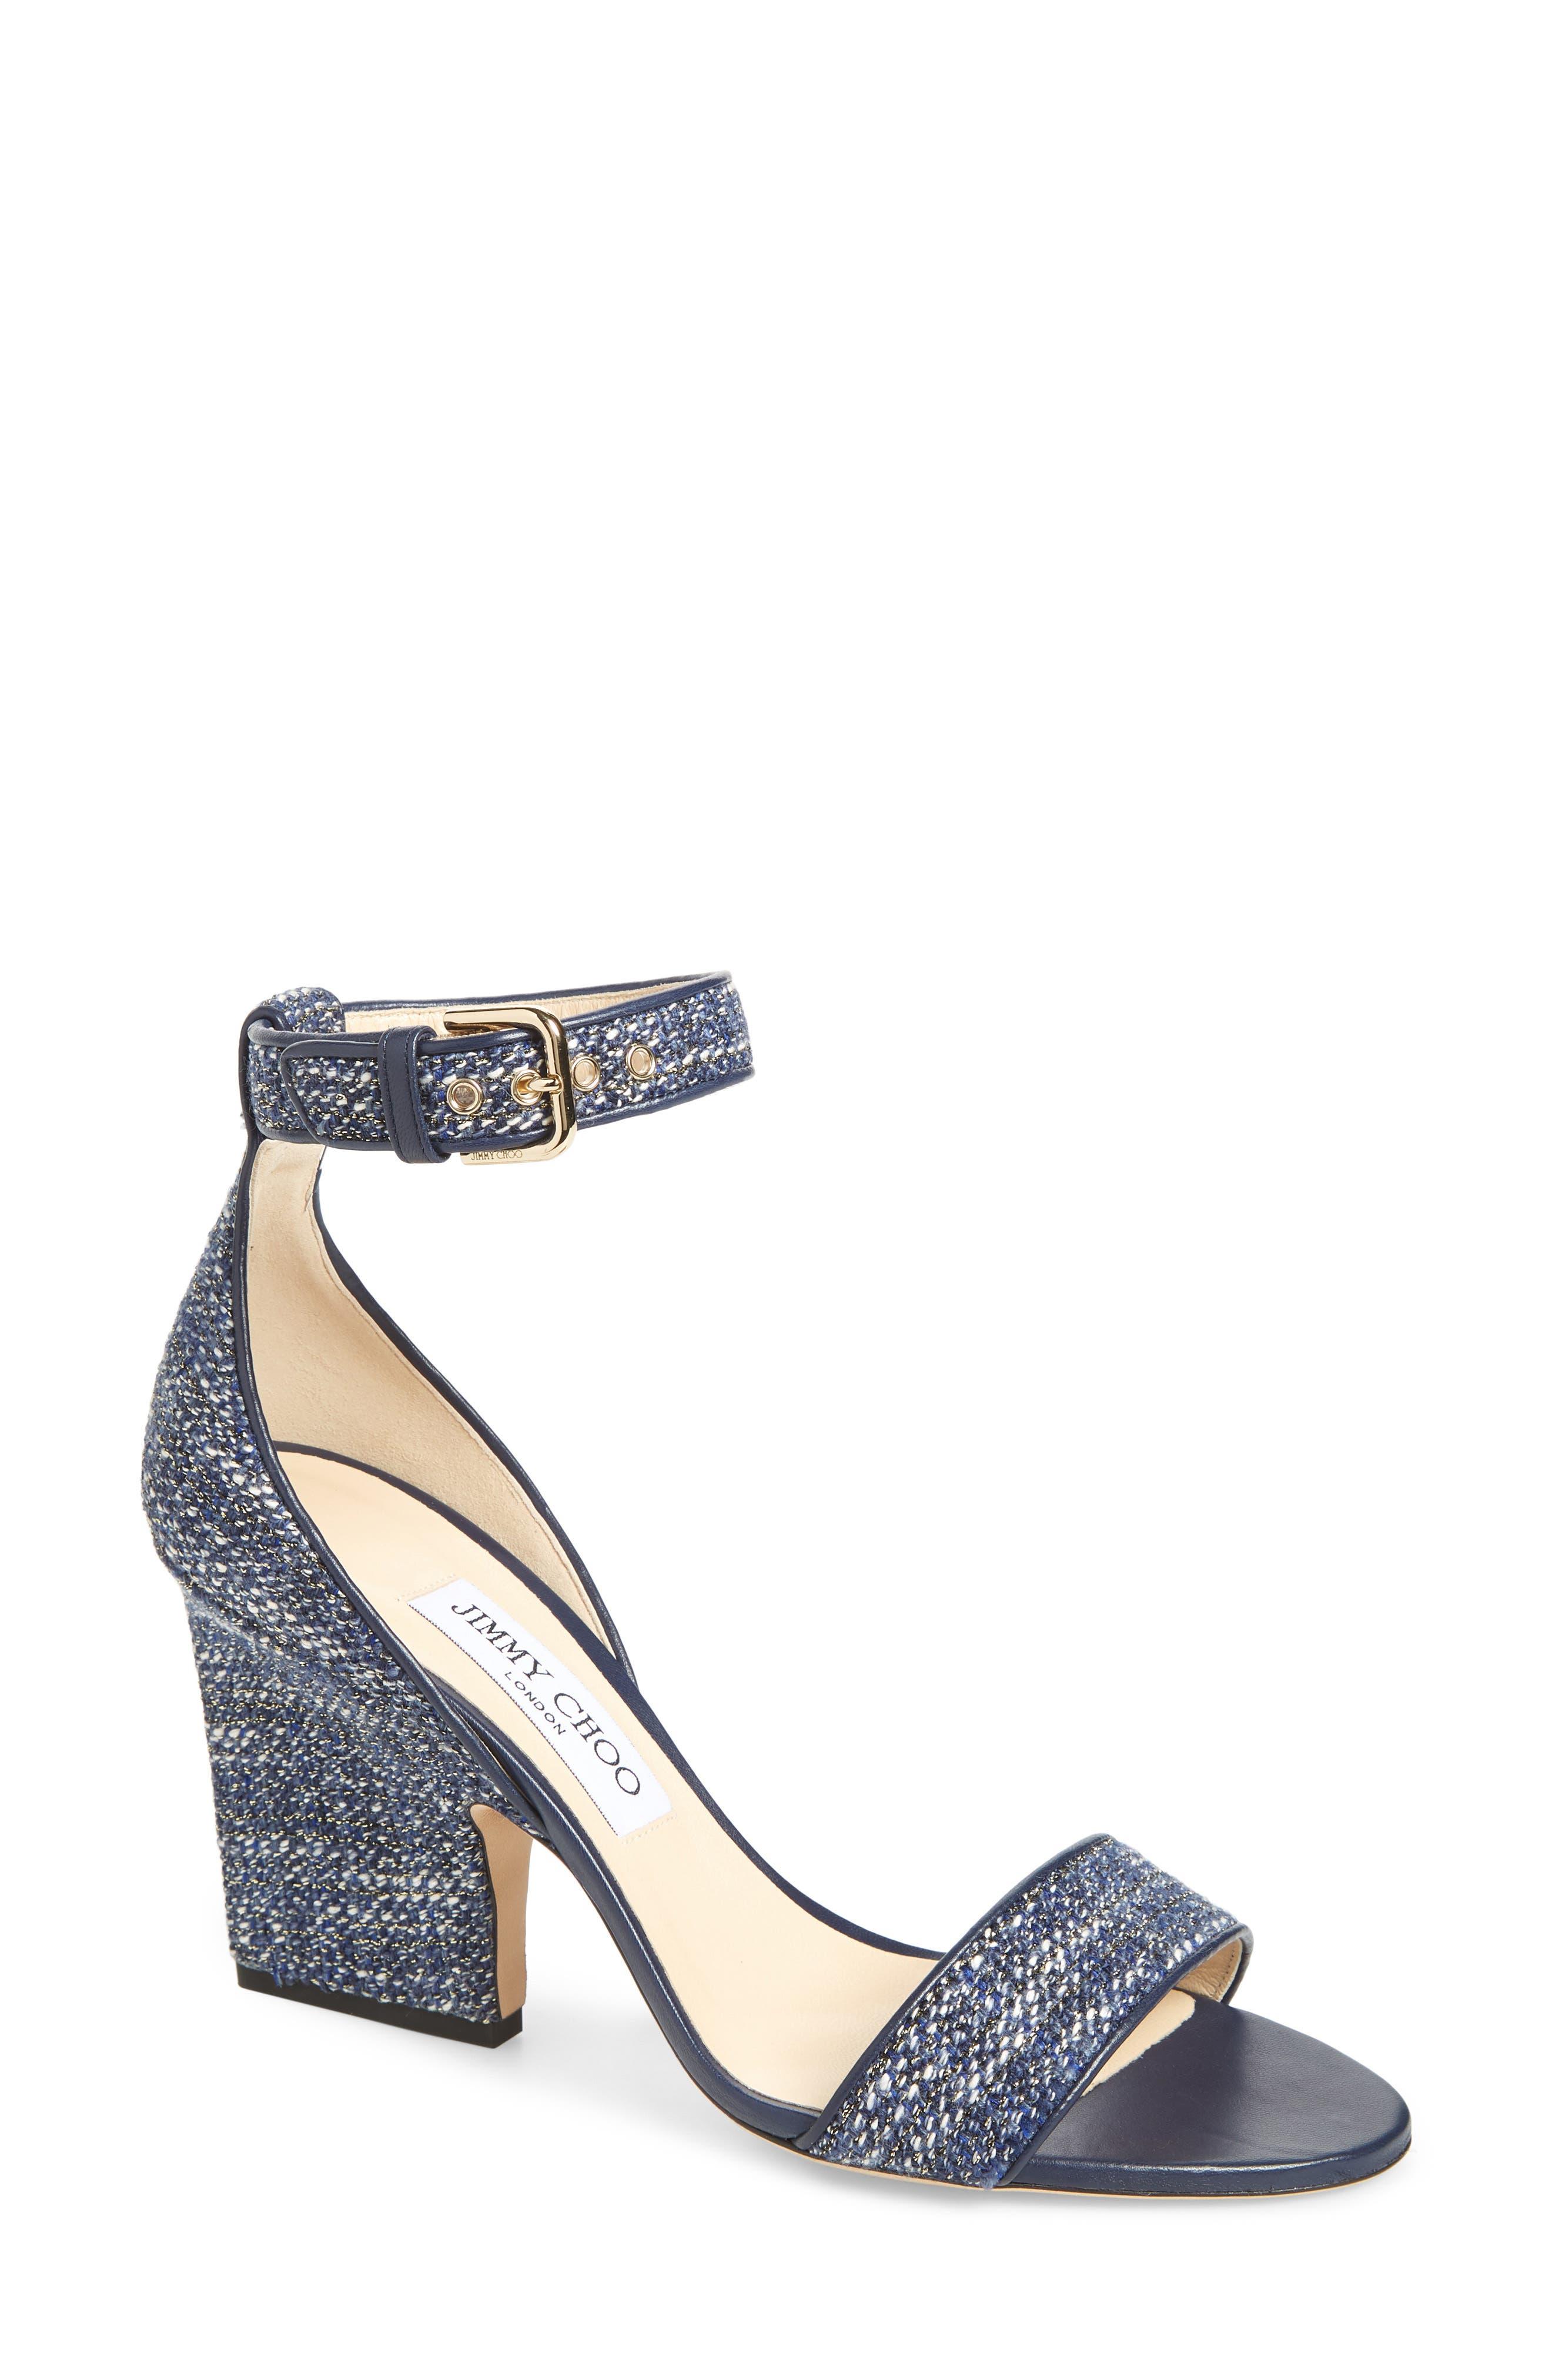 Edina Ankle Strap Sandal,                             Main thumbnail 1, color,                             Navy Glitter